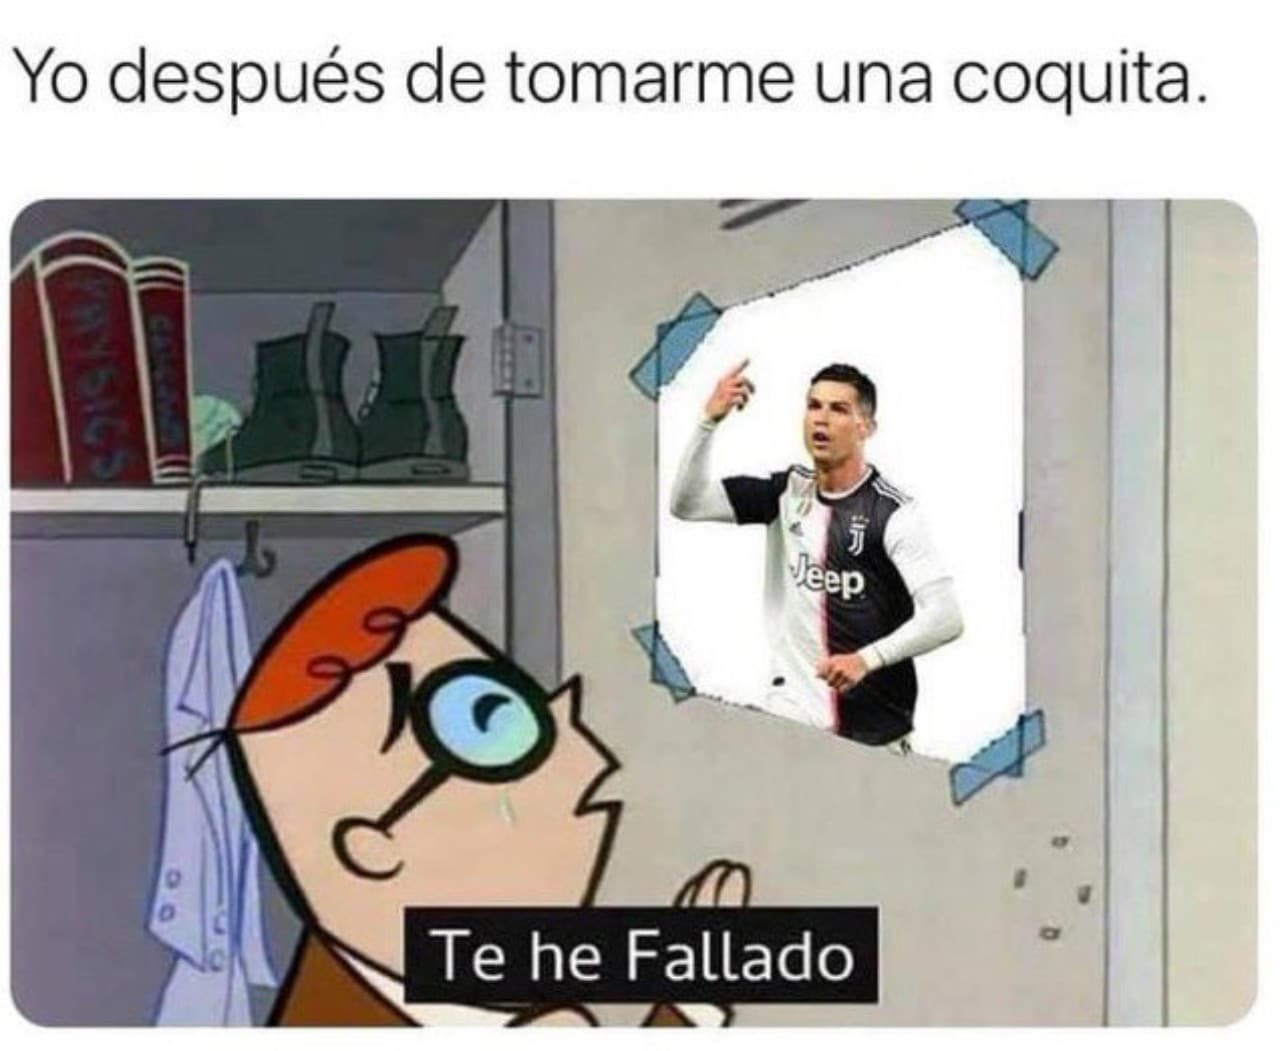 Meme Te he fallado Cristiano Ronaldo